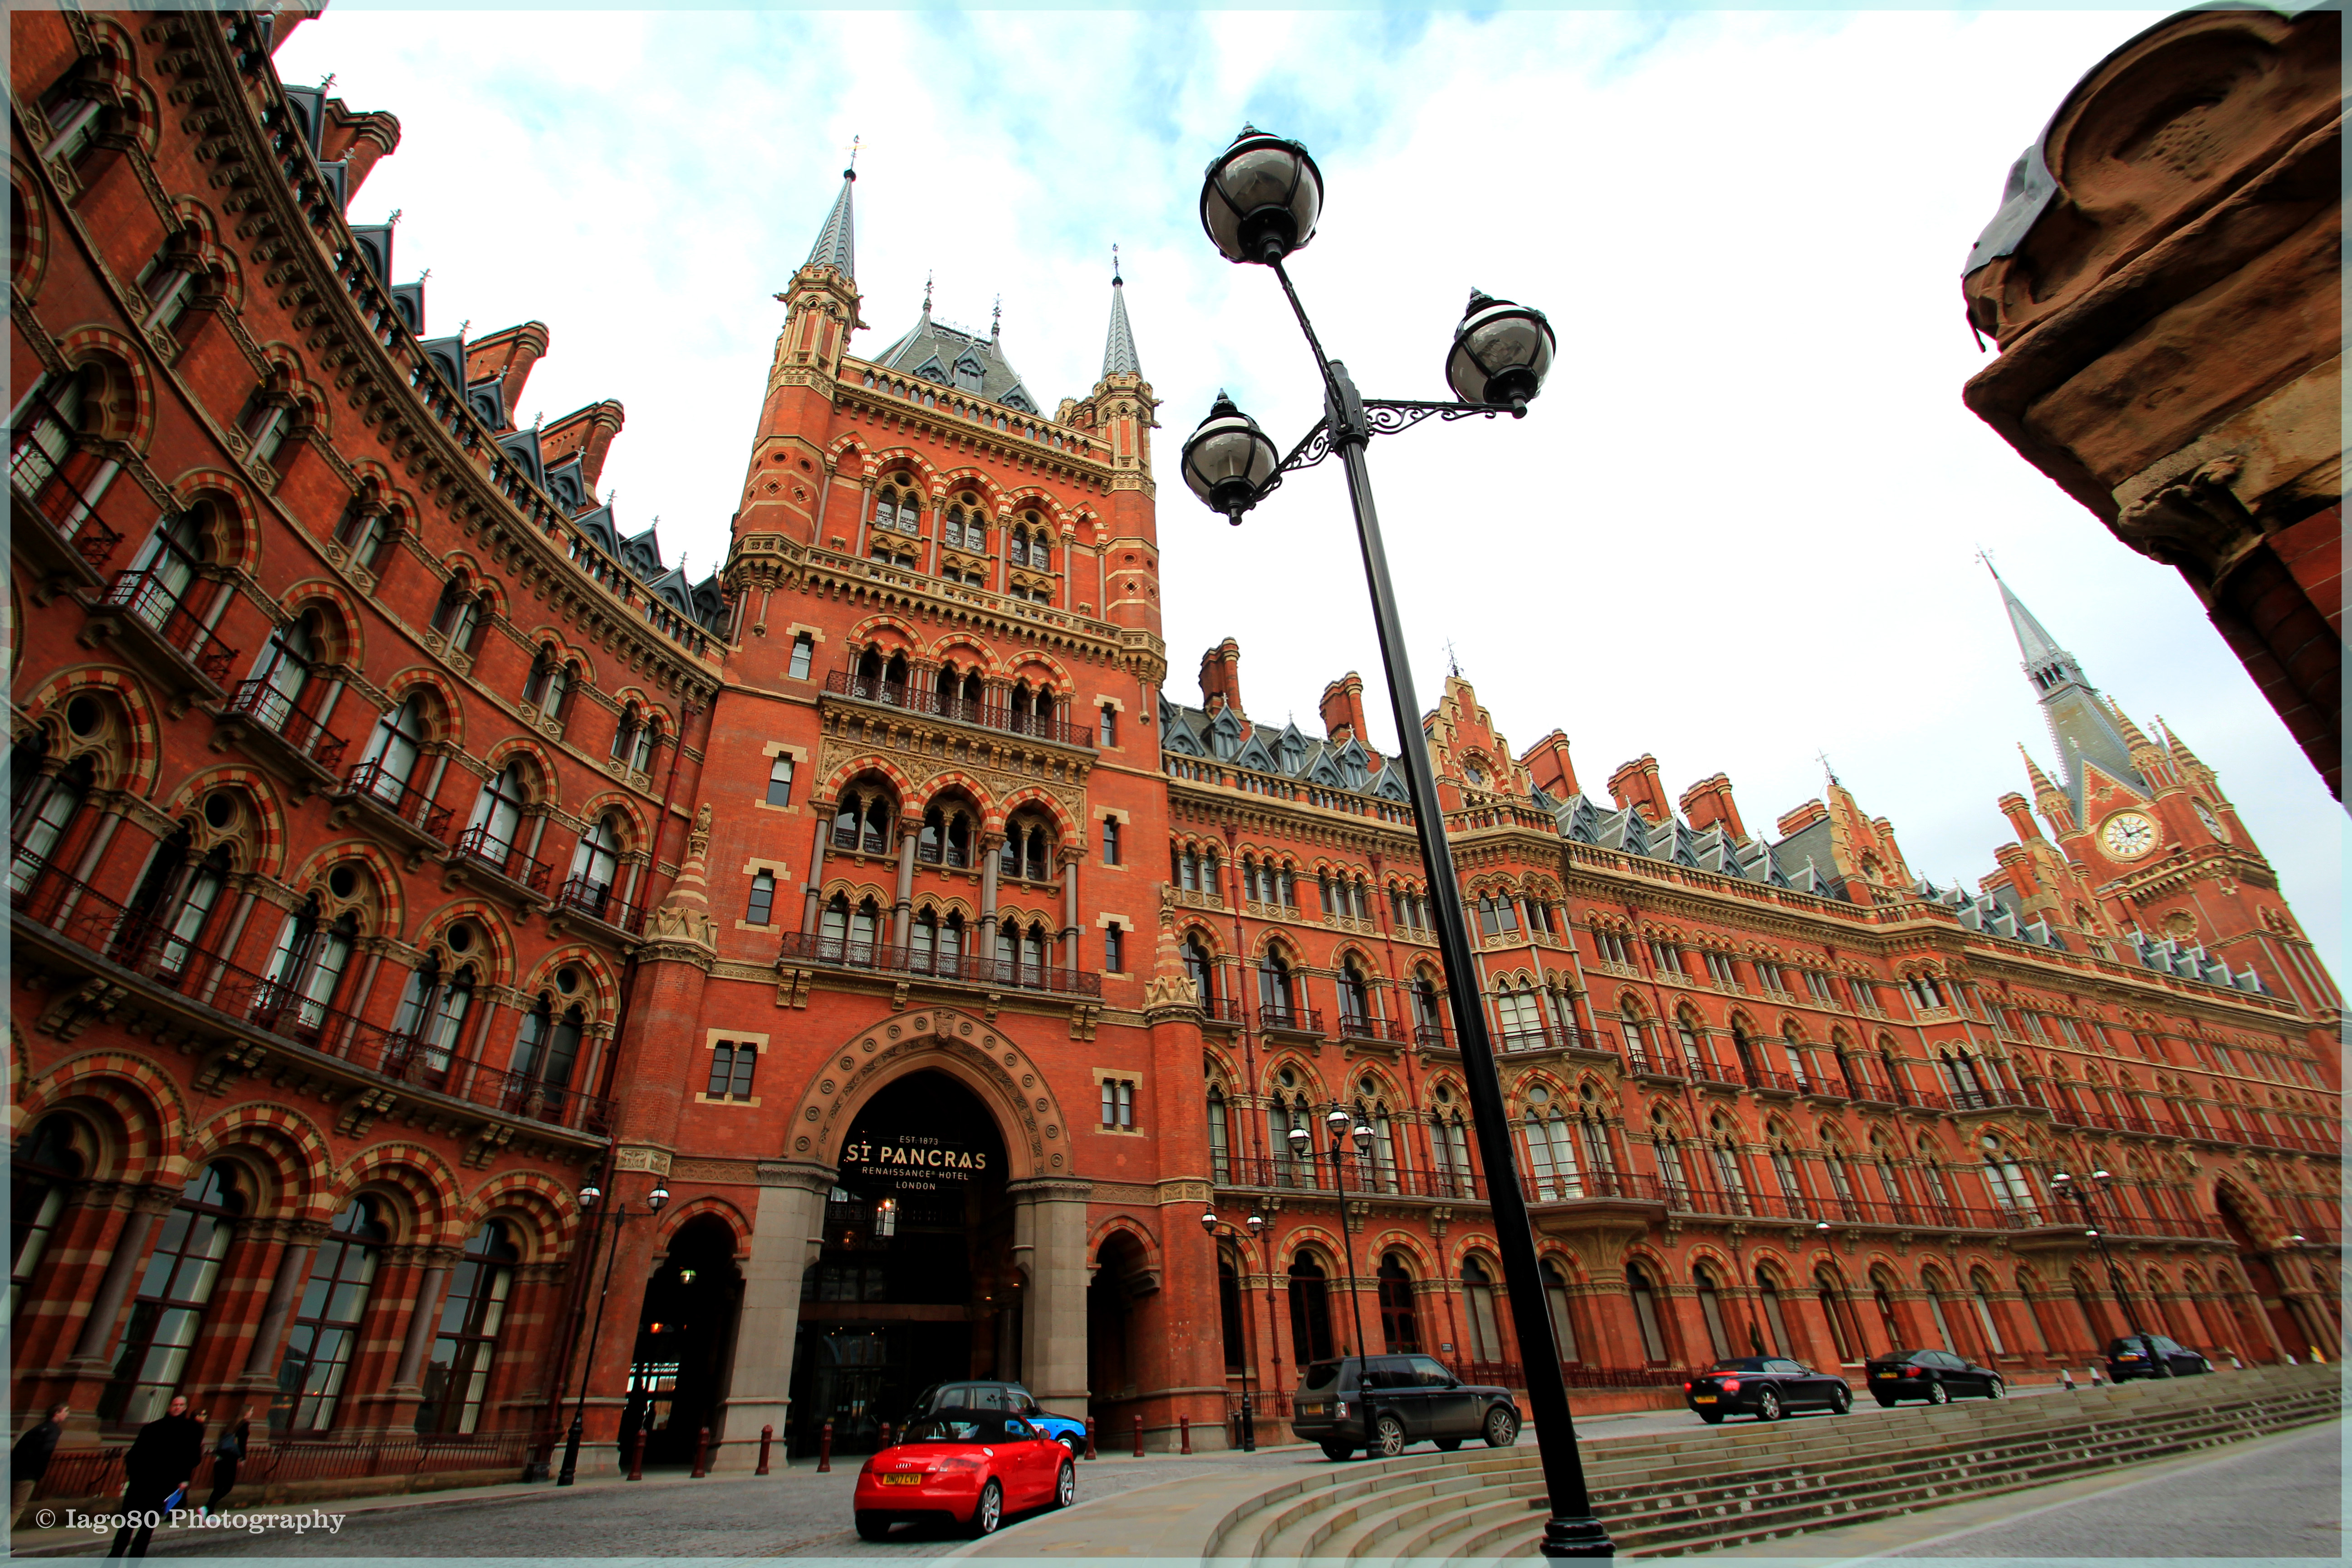 London Midland Hotel